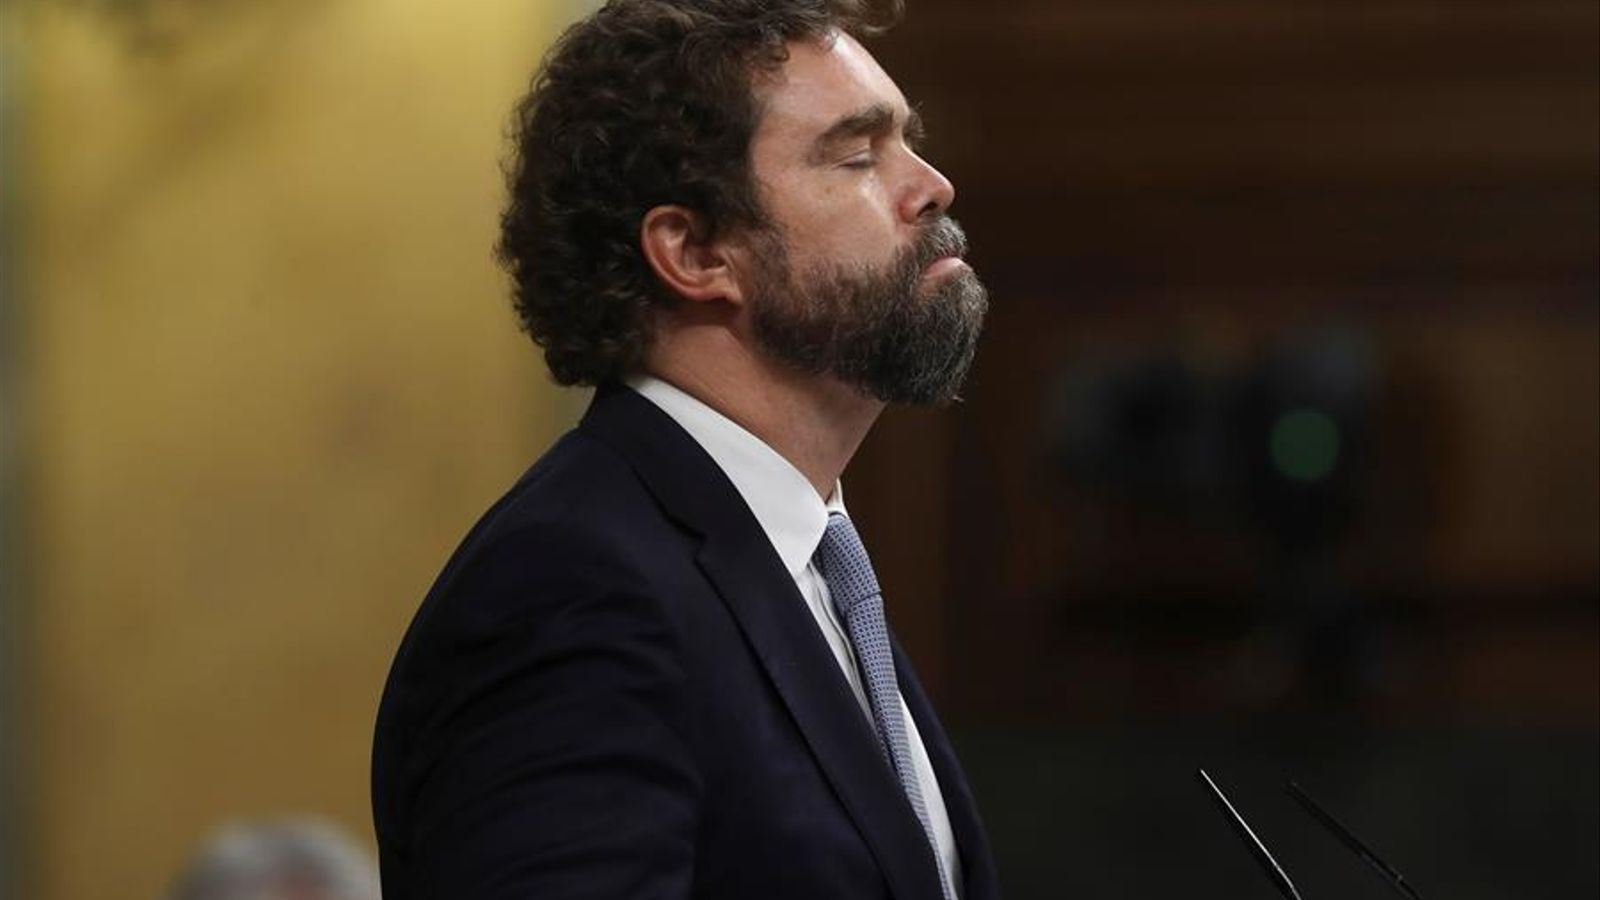 El portaveu de Vox al Congrés, Iván Espinosa de los Monteros